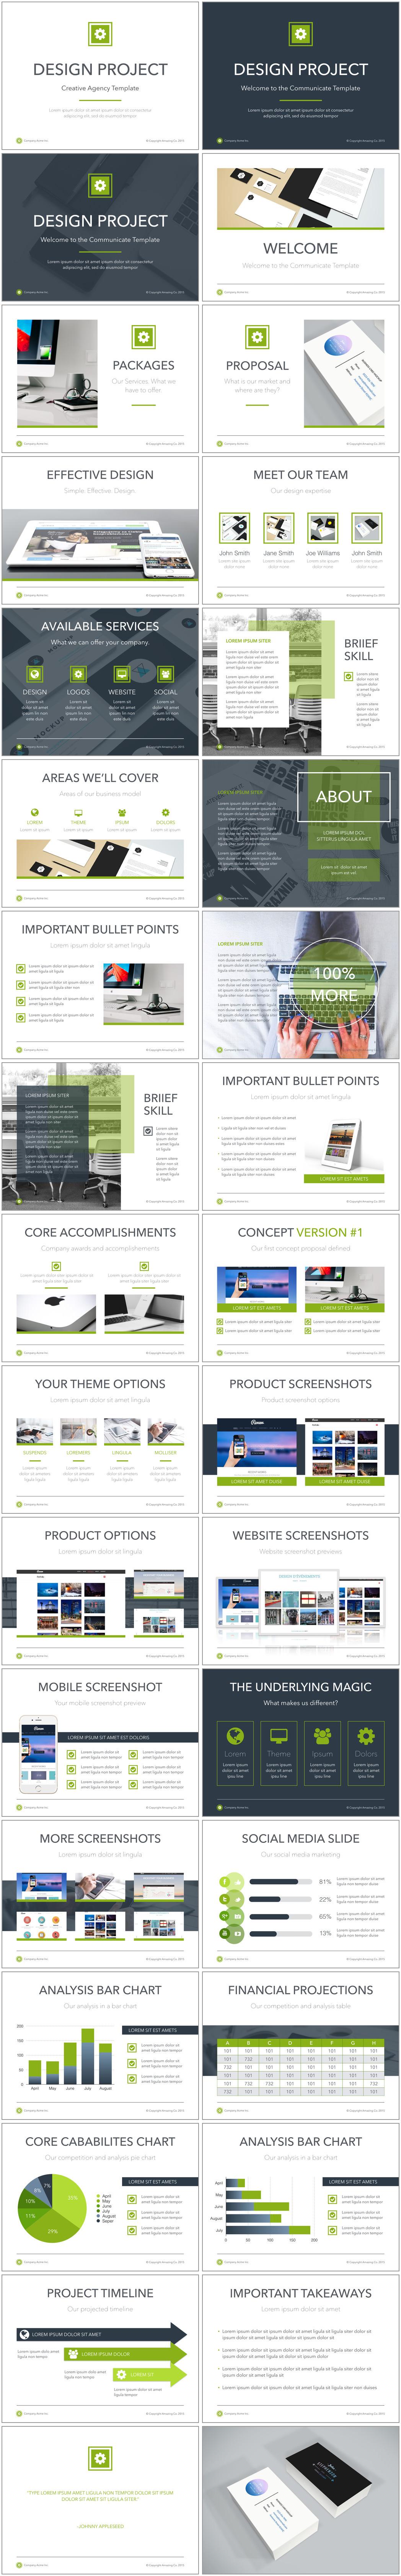 Design Project Presentation Proposal Keynote Templates